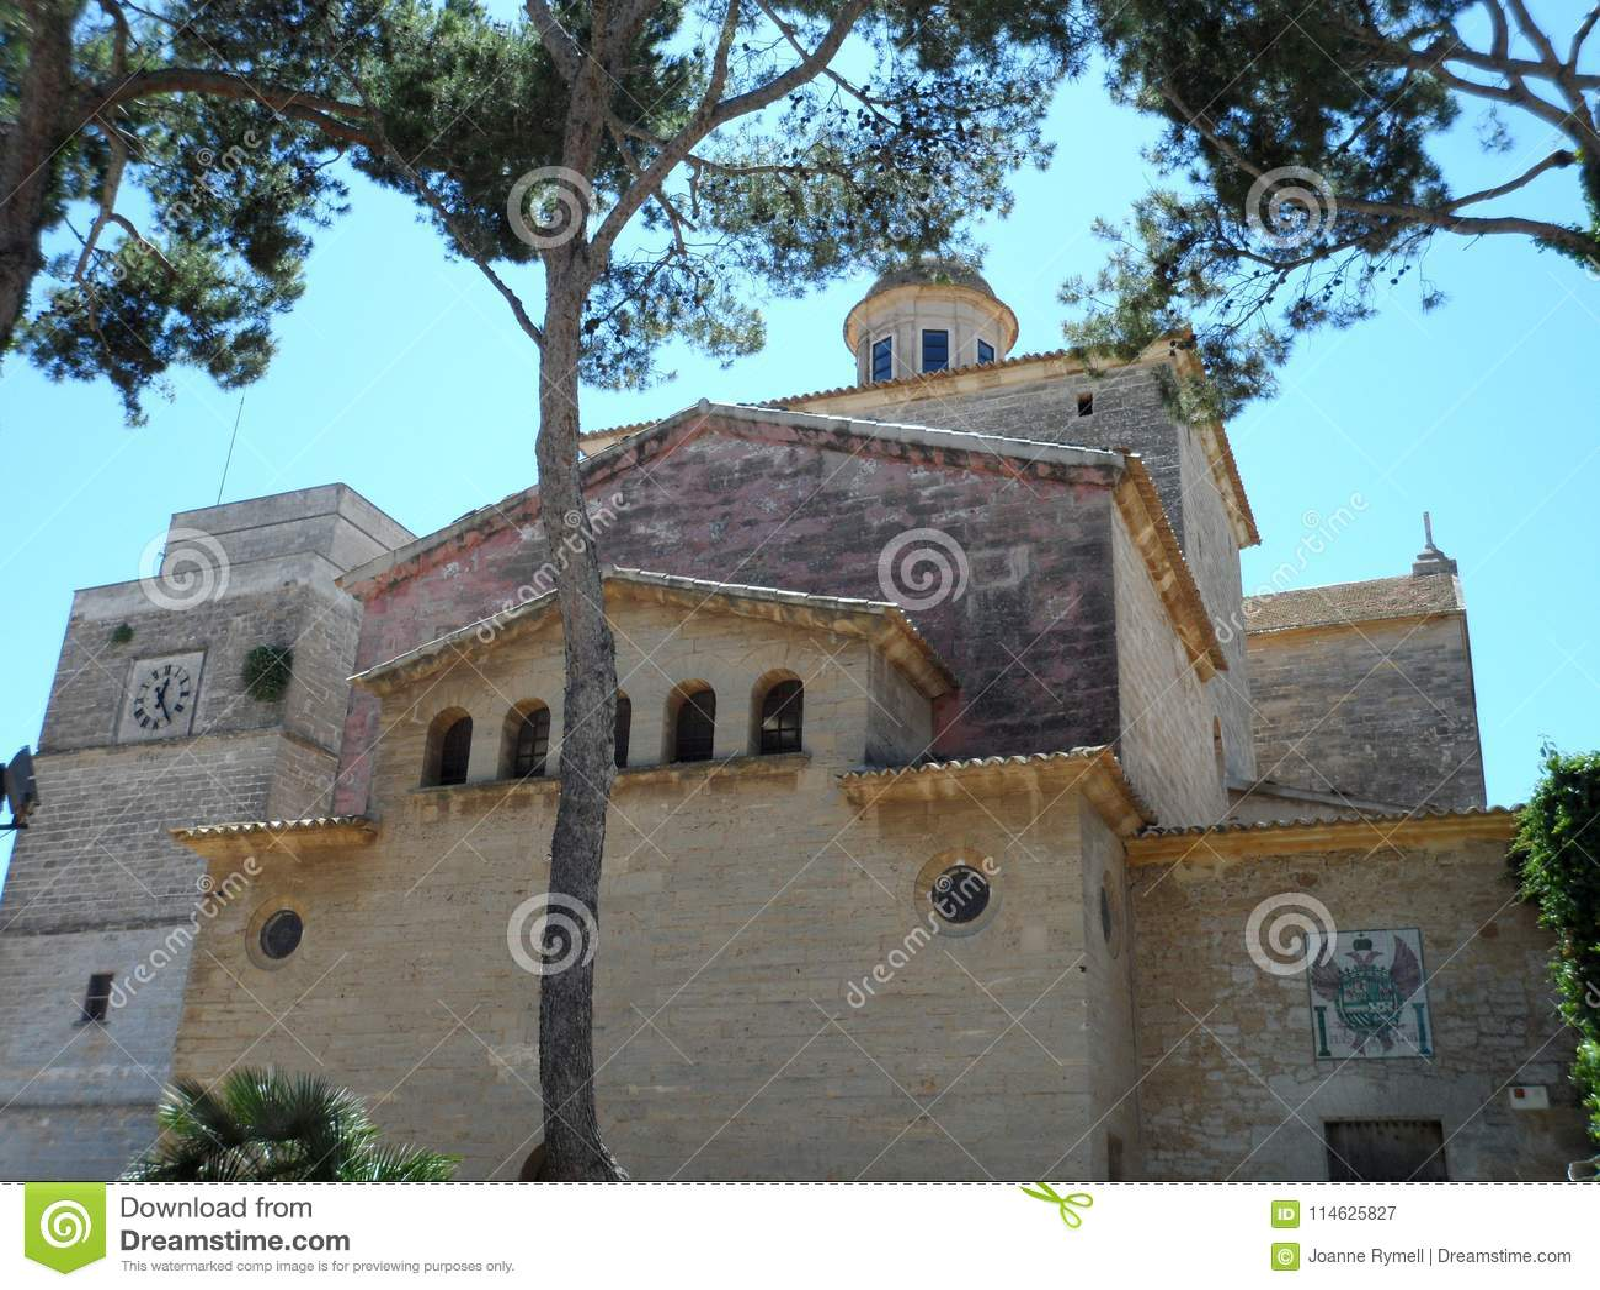 Majorca dating sites